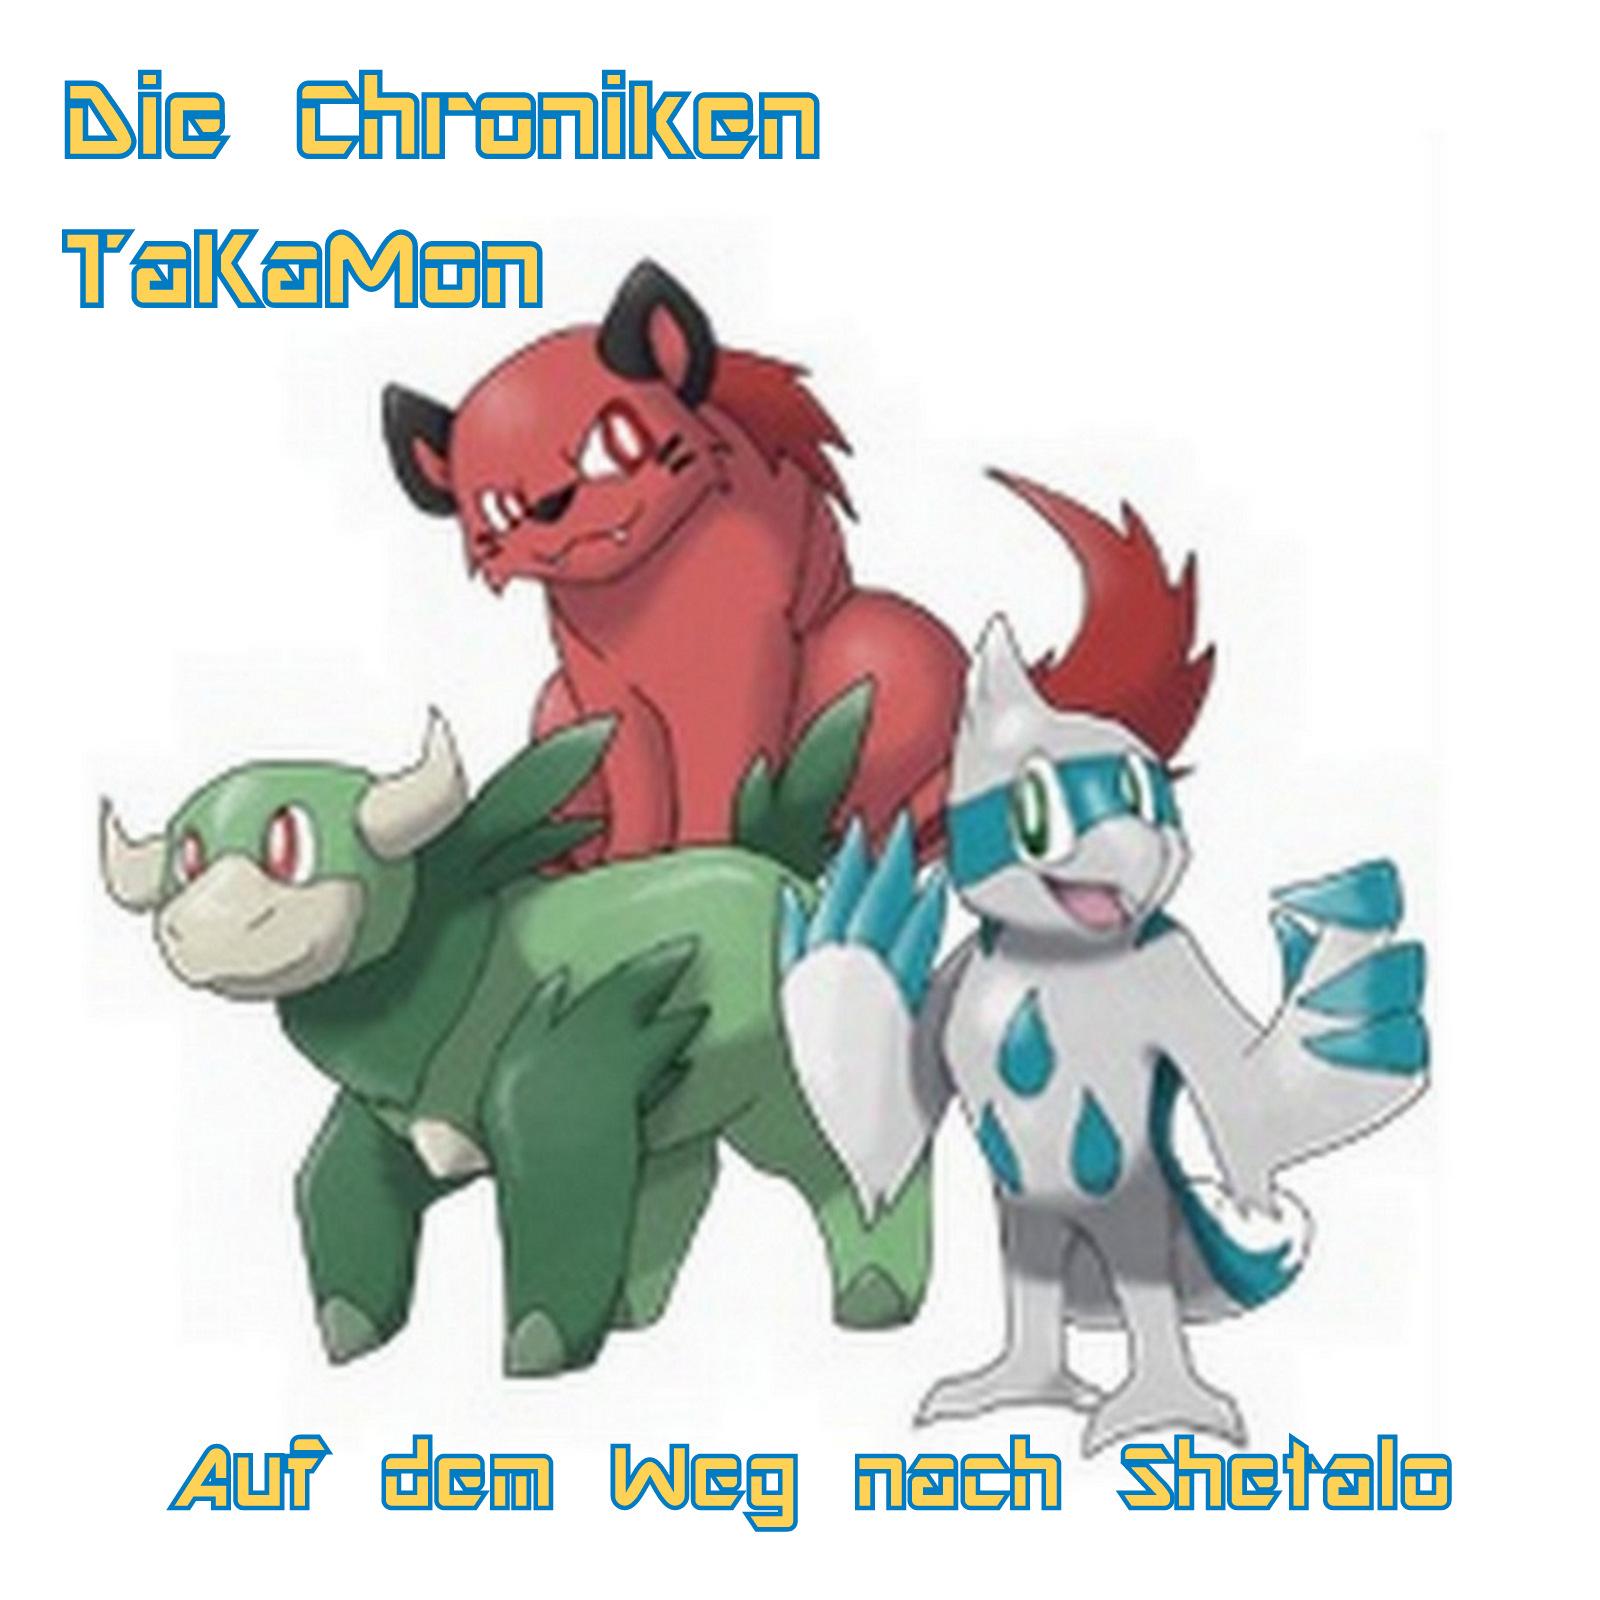 TaKaMon 02 - Auf dem Weg nach Shetalo